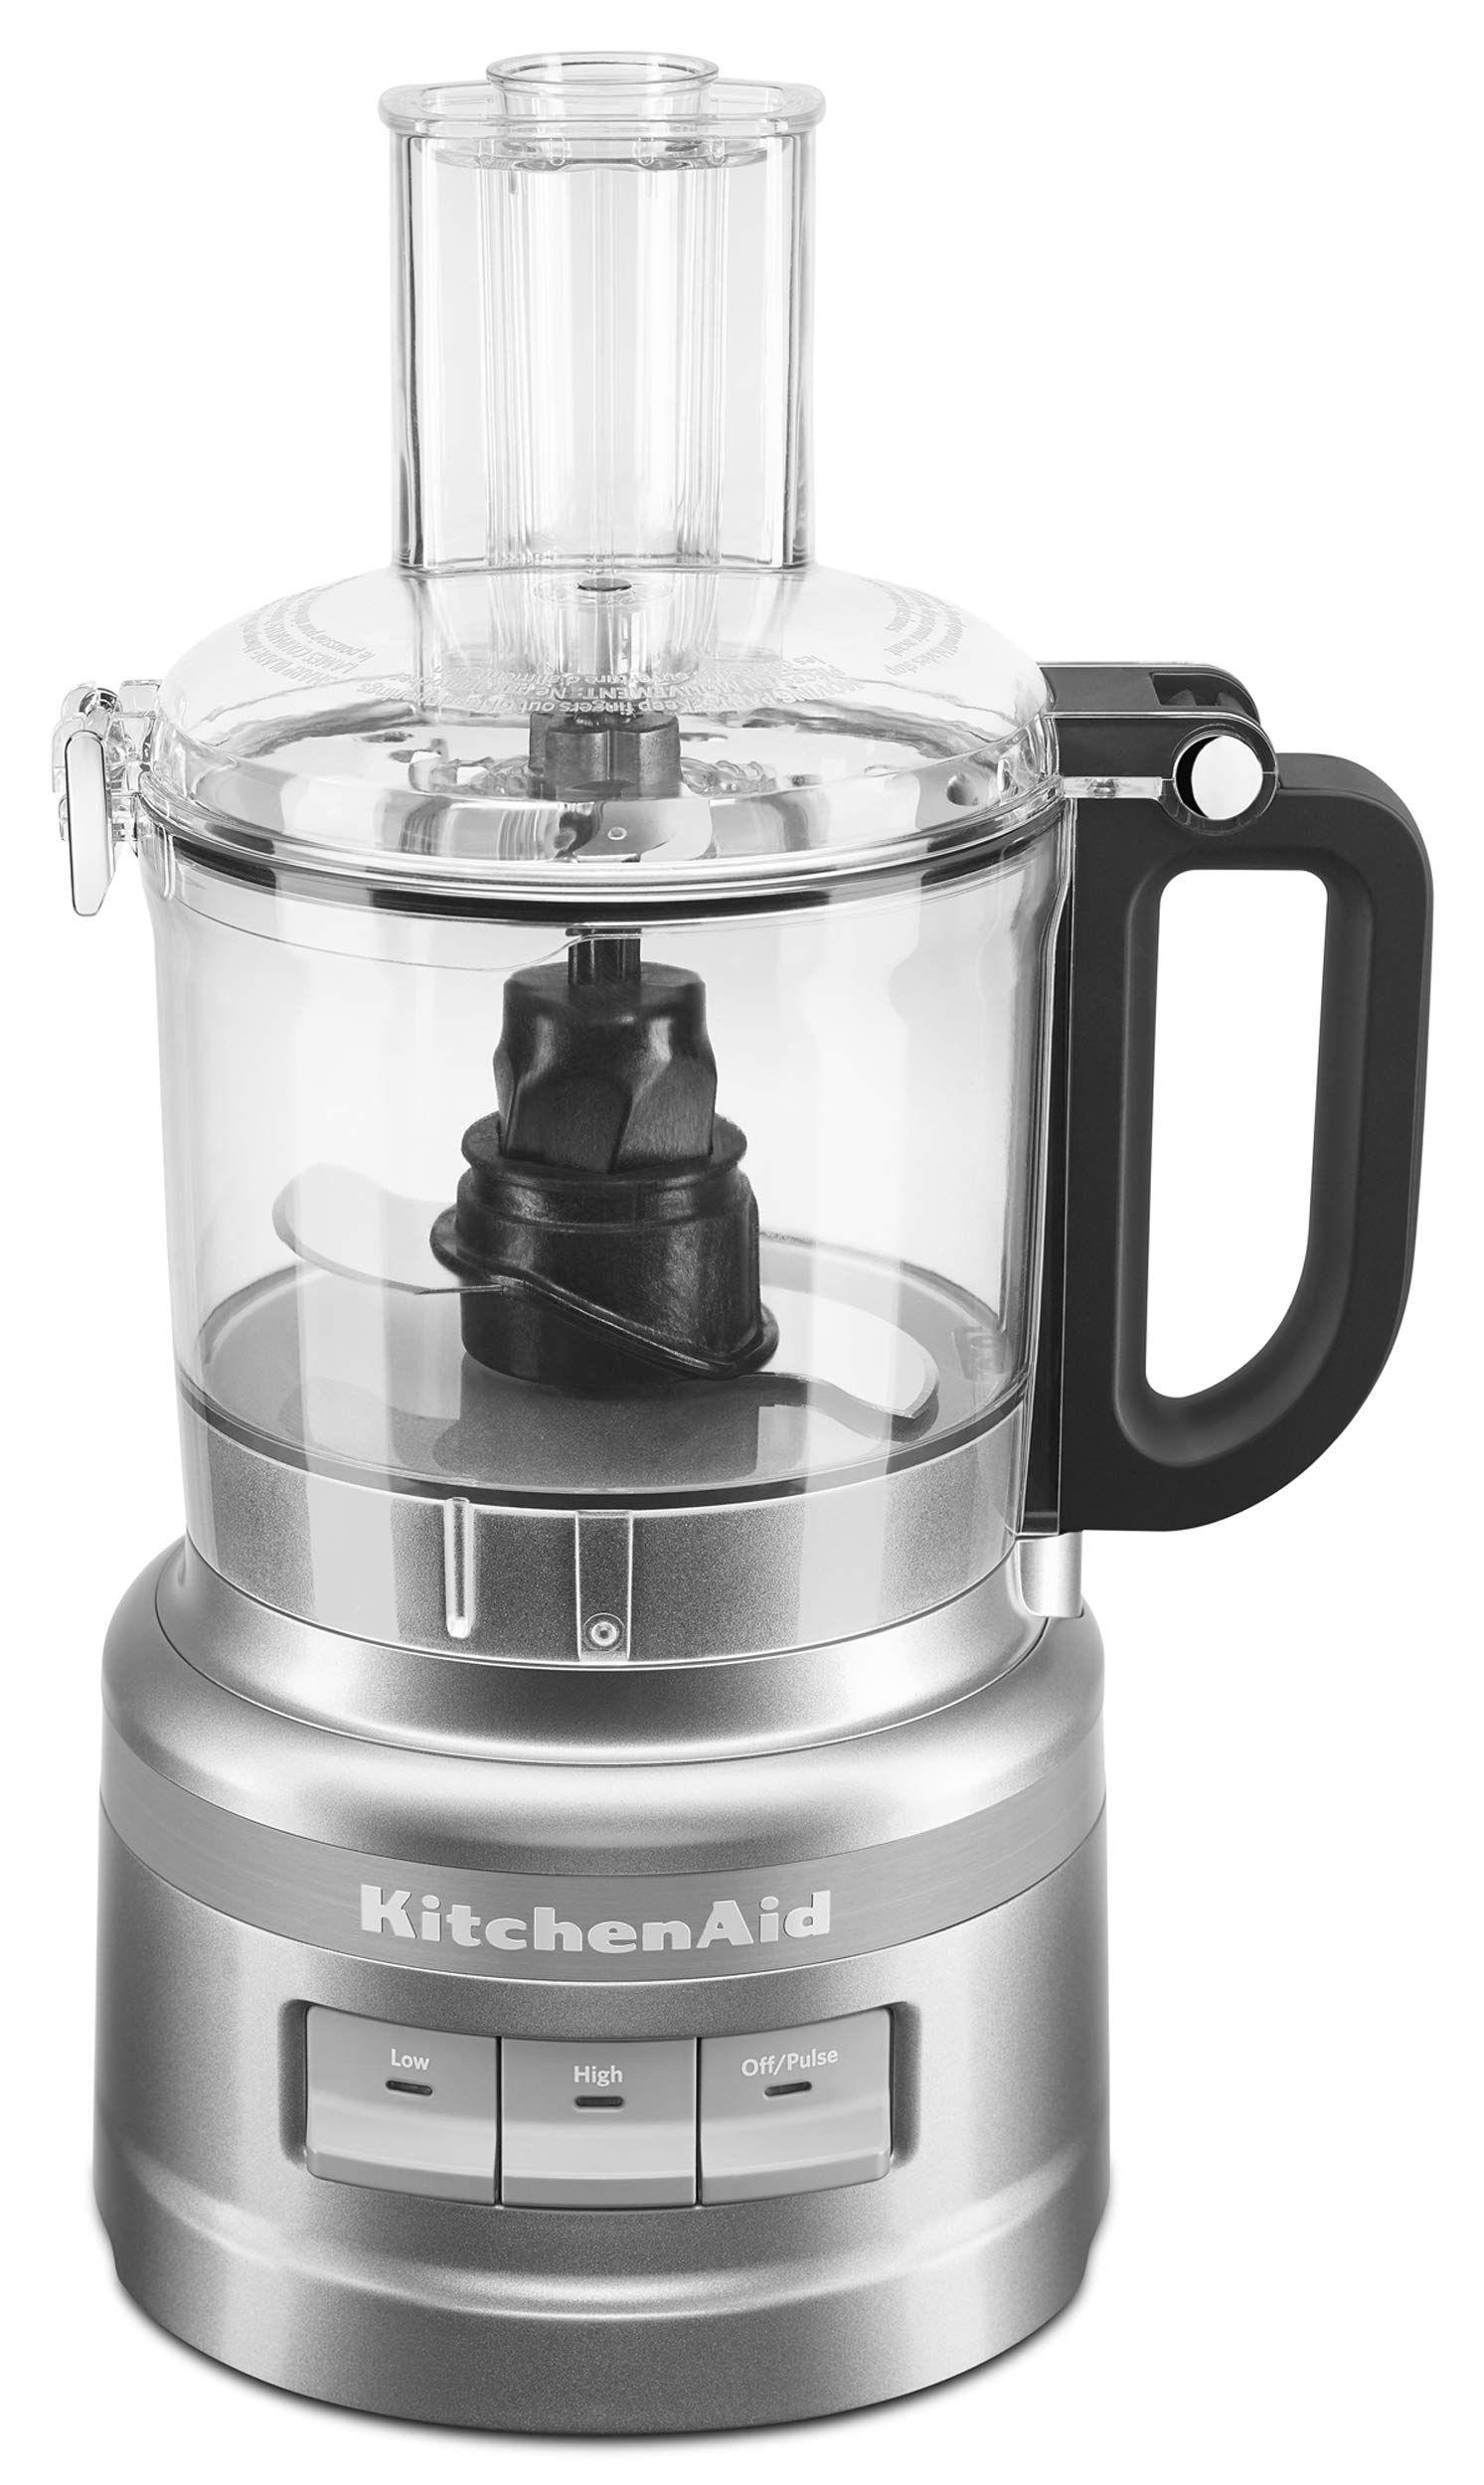 KitchenAid KFP0718CU 7Cup Food Food processor recipes